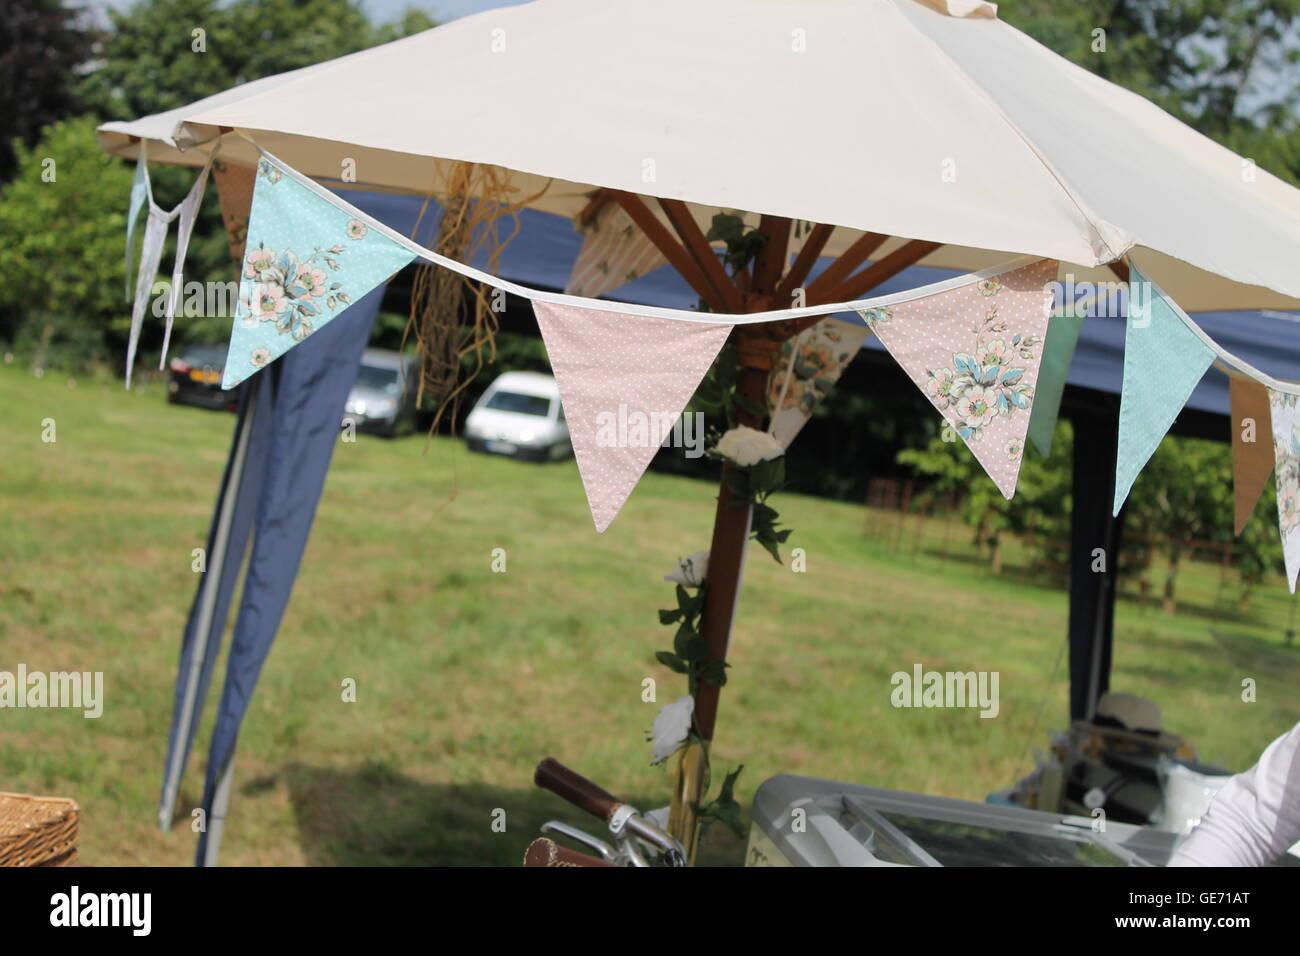 Bunting summer wedding party c&ing tent gl&ing garland outdoor decoration garden party vintage flags & Bunting summer wedding party camping tent glamping garland ...